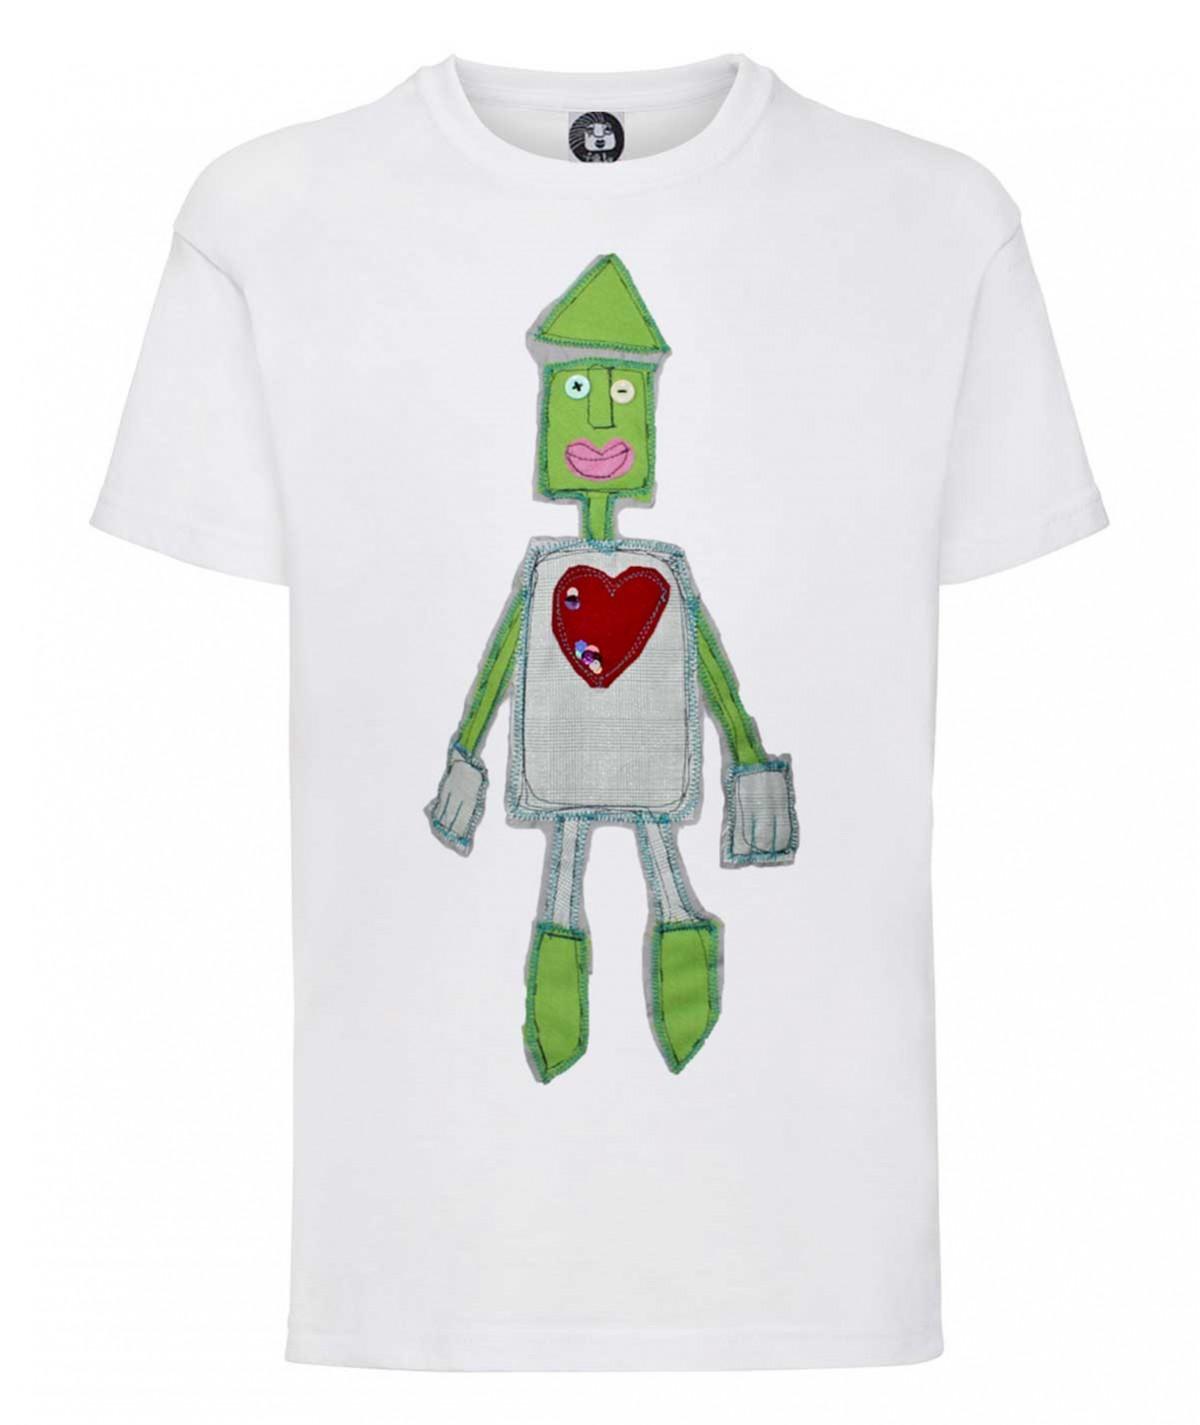 T-shirt con il robot